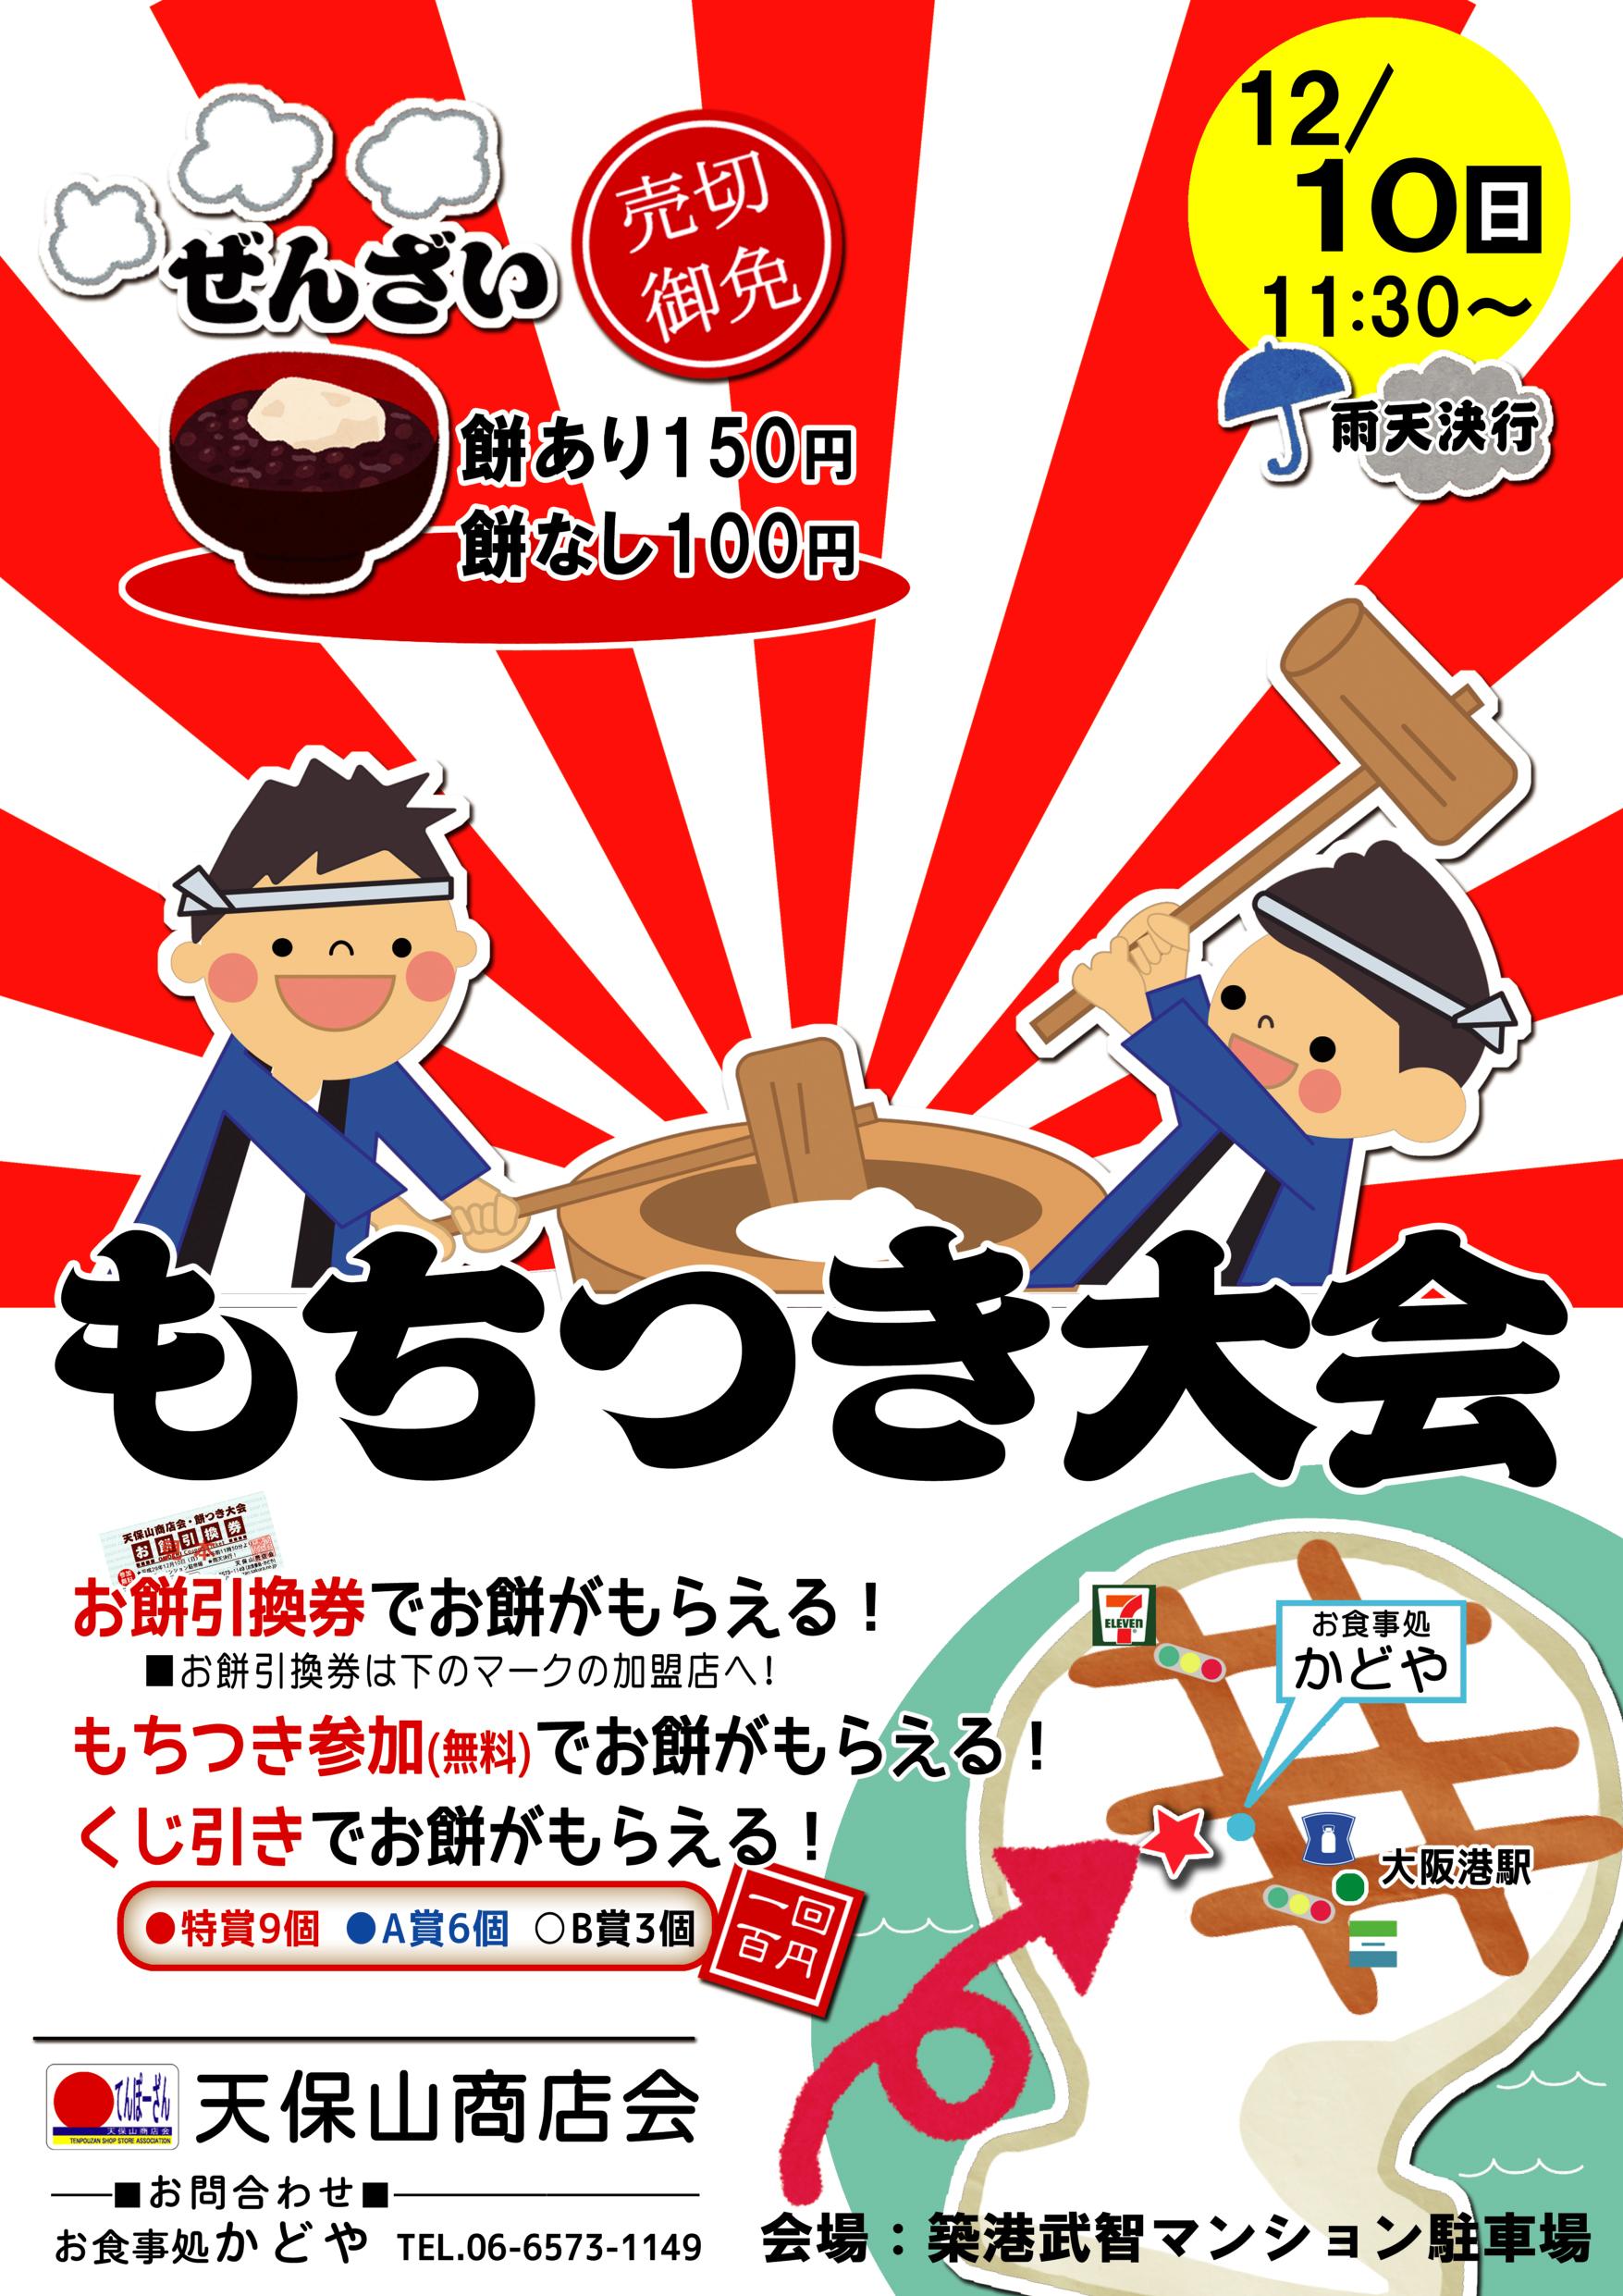 http://tenpouzan.sakura.ne.jp/images/2017_mochi.jpg